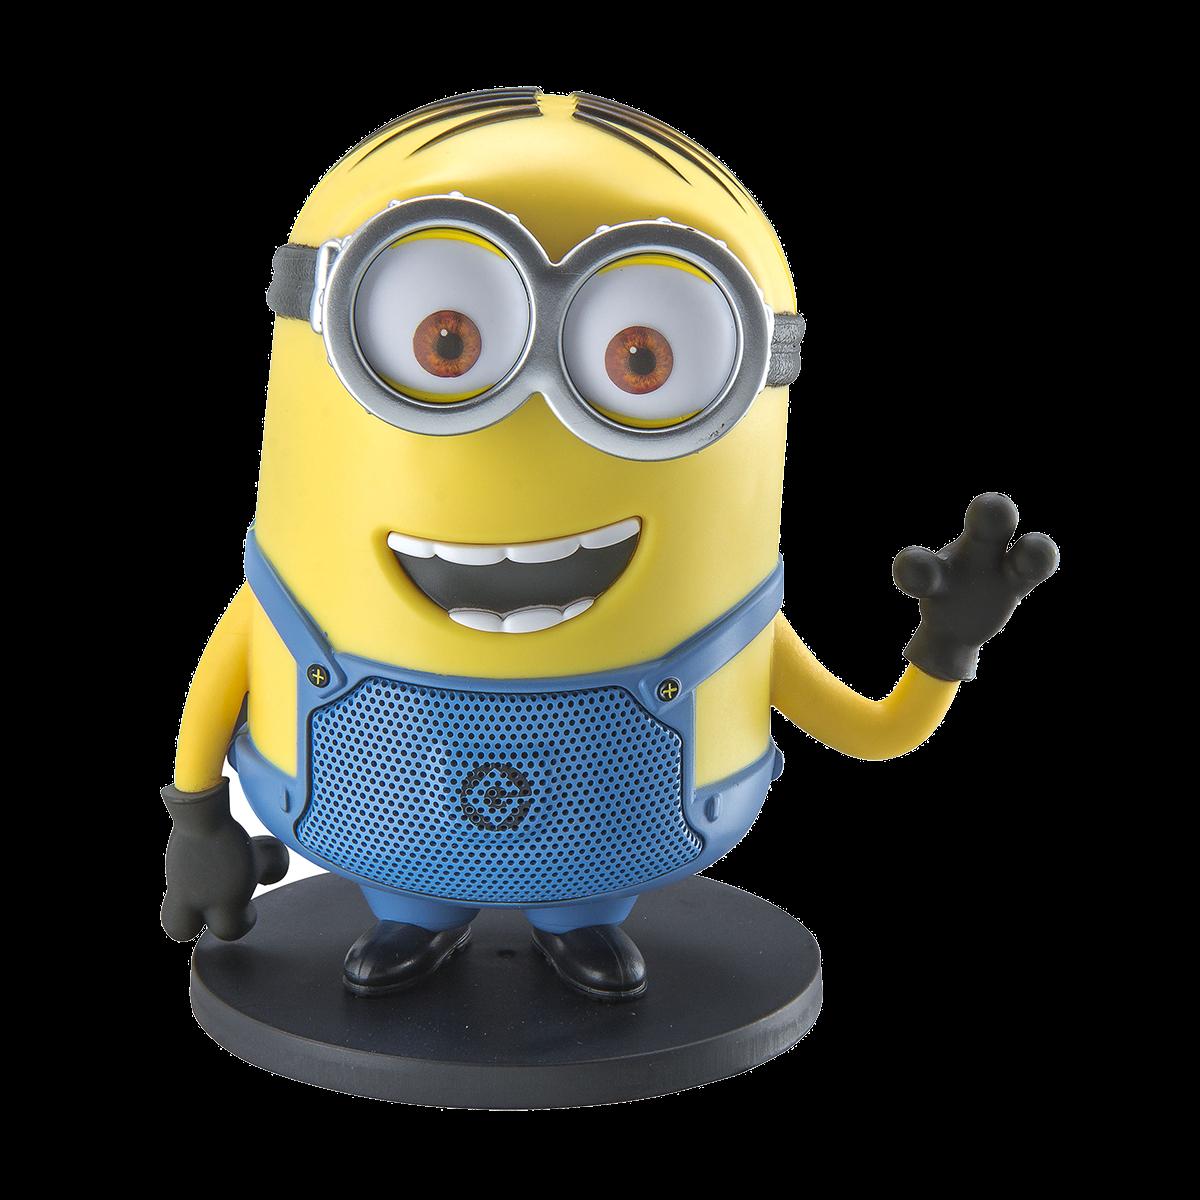 iHome Bluetooth Speaker Ασύρματο Ηχείο - Despicable Me Minion (44453)